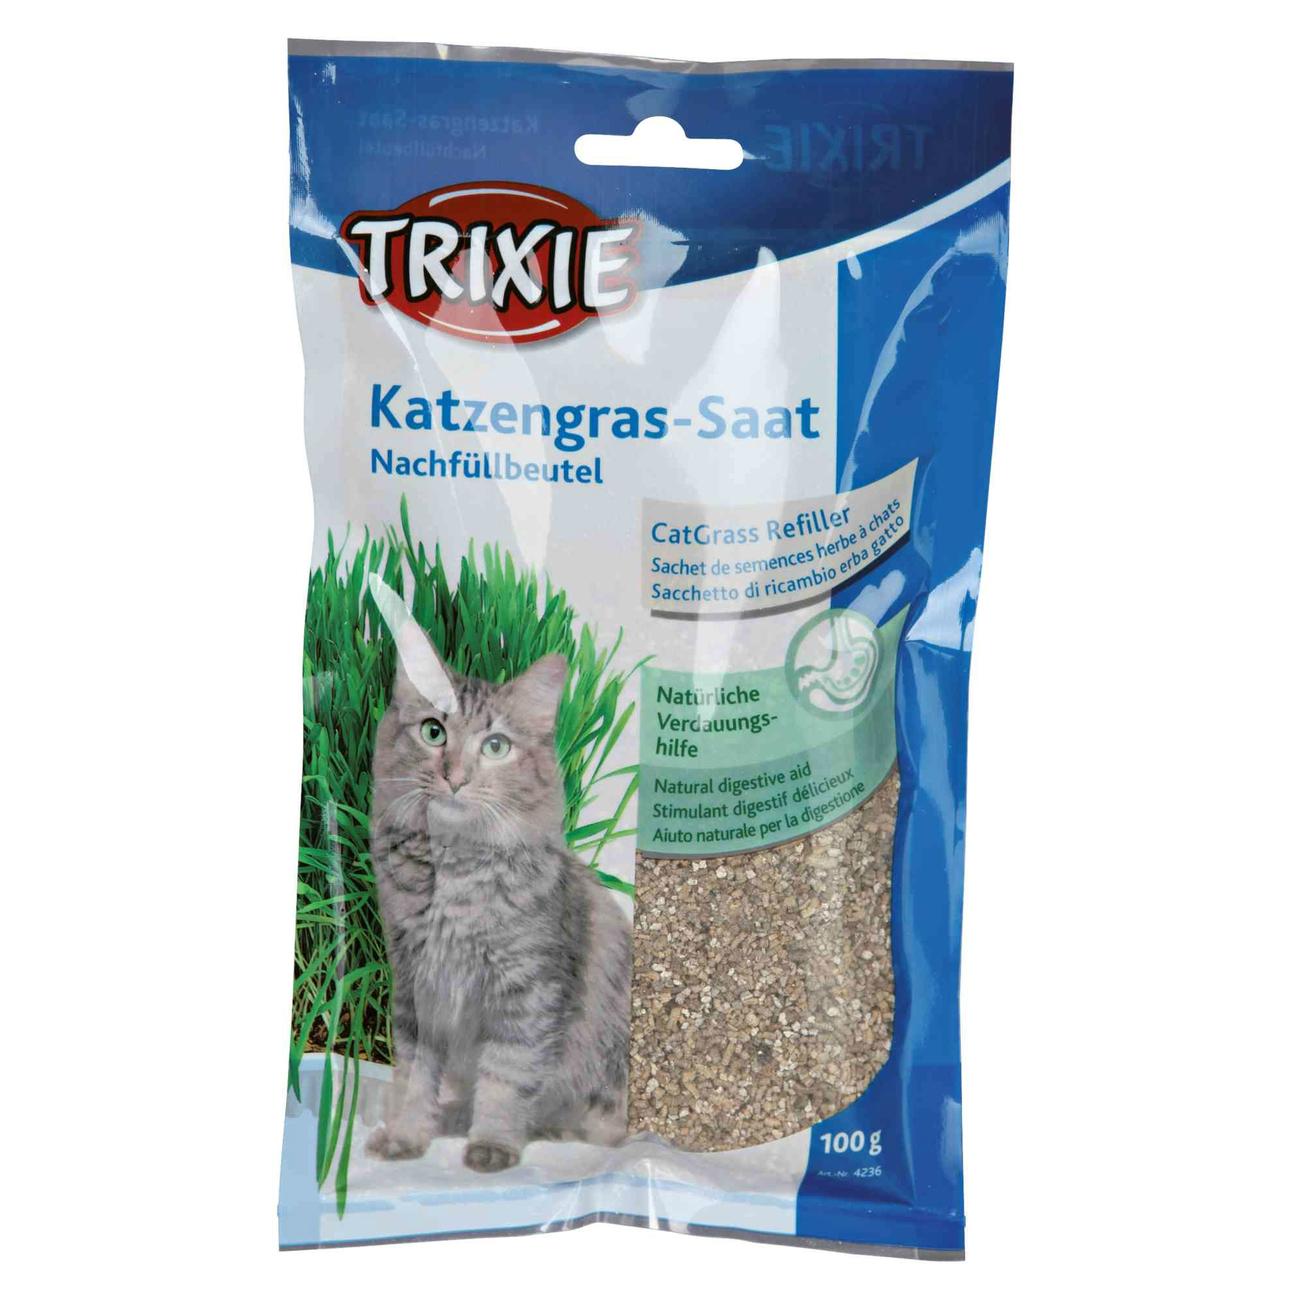 TRIXIE Katzengras 4236, Bild 4